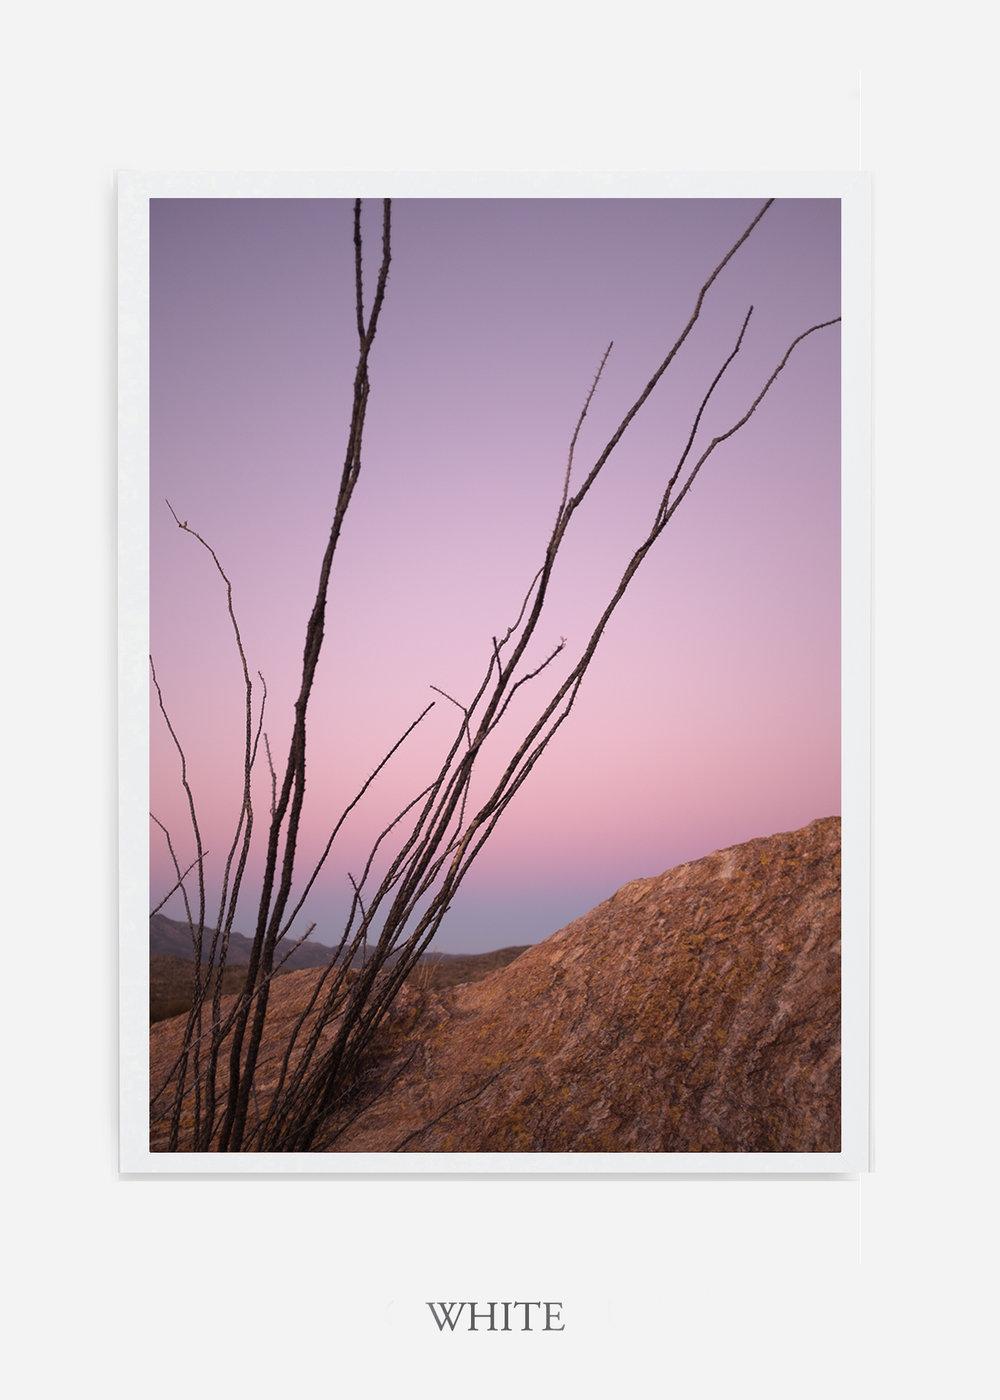 nomat-whiteframe-saguaroNo.12-wildercalifornia-art-wallart-cactusprint-homedecor-prints-arizona-botanical-artwork-interiordesign.jpg